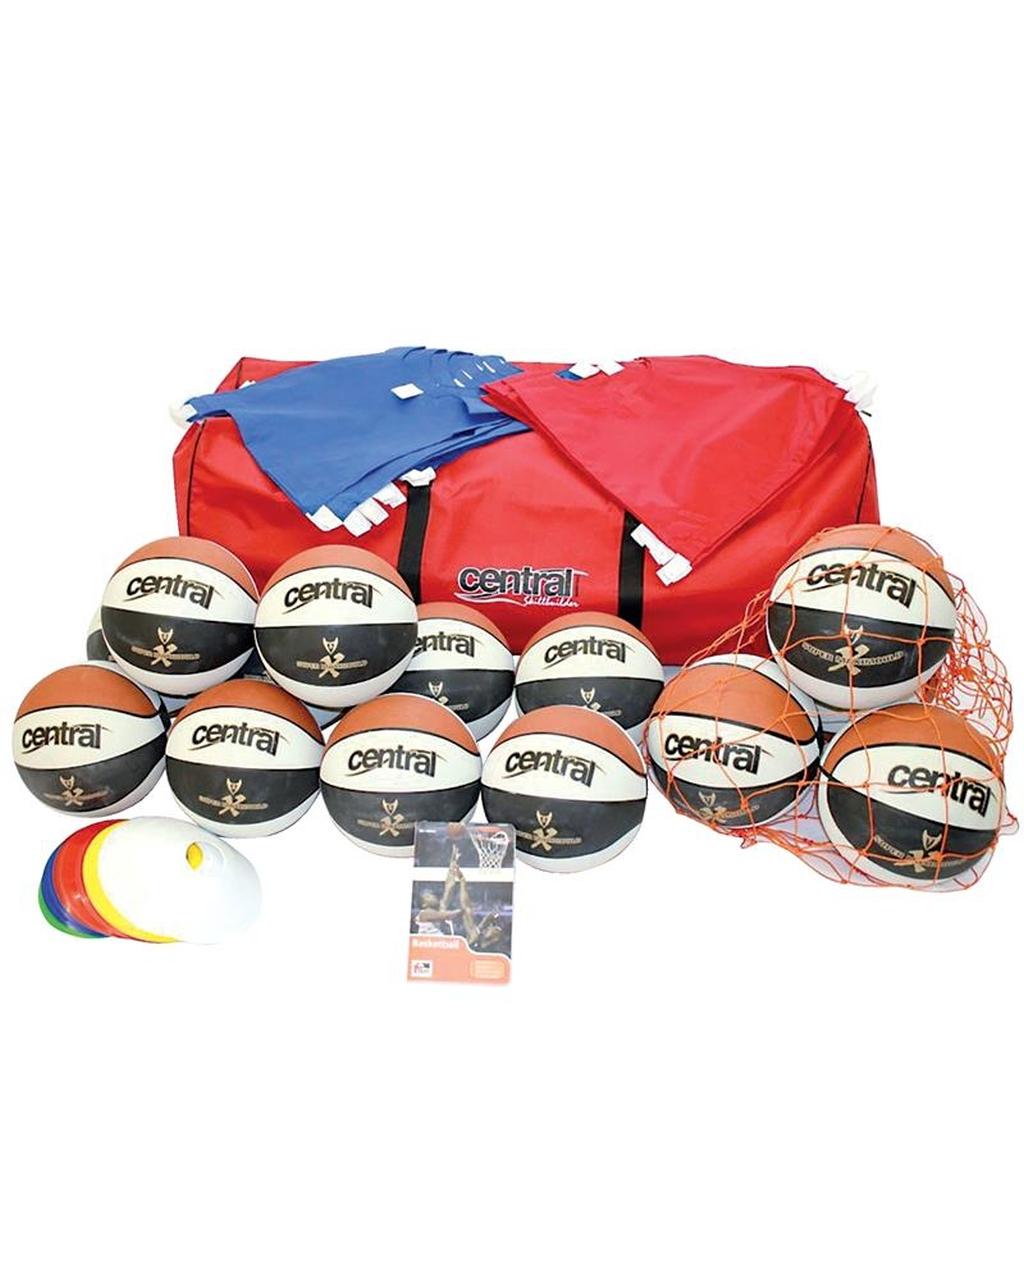 Primary Basketball Set